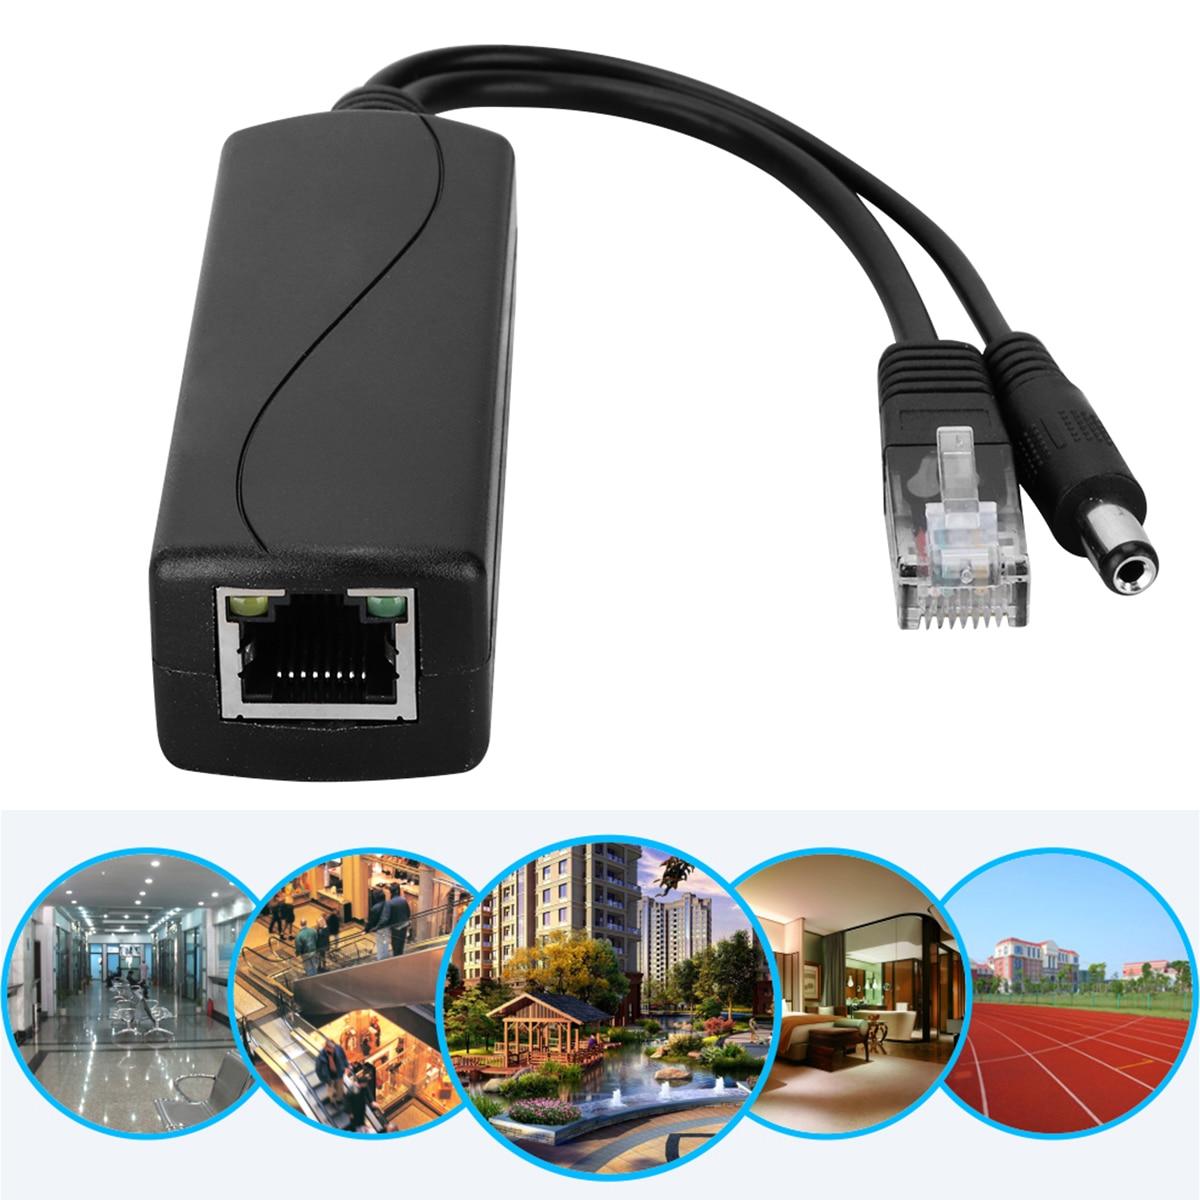 48V To 12V POE Connectors Adapter Cable Splitter Injector Power Supply POE Splitter For Hikvision POE Splitters